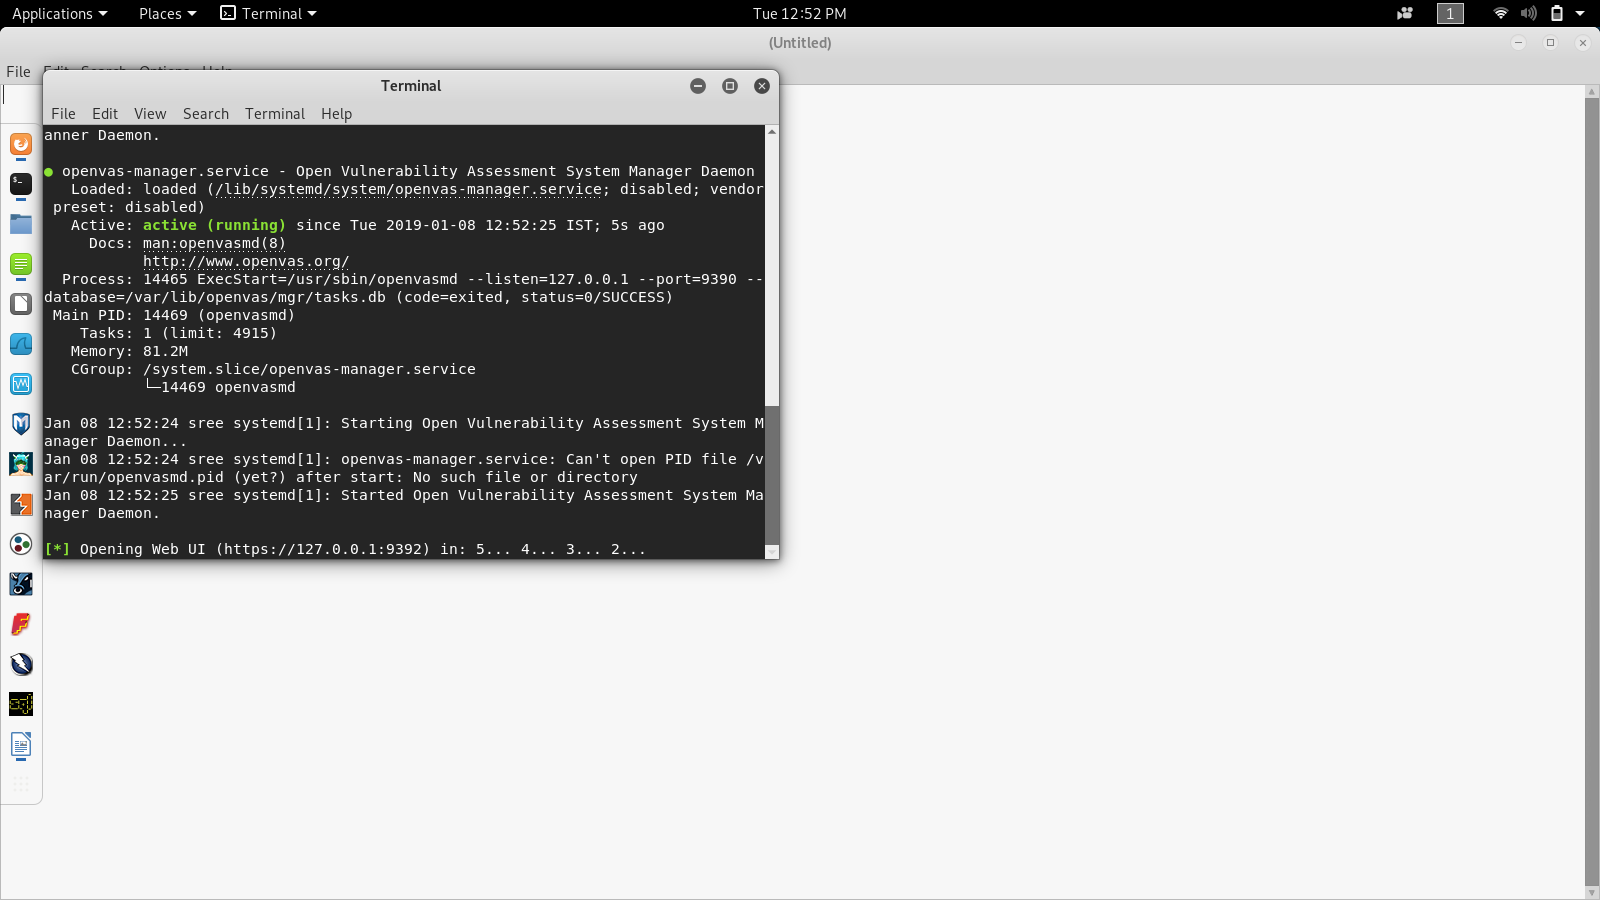 OpenVAS Scanner - The Network Vulnerability scanner